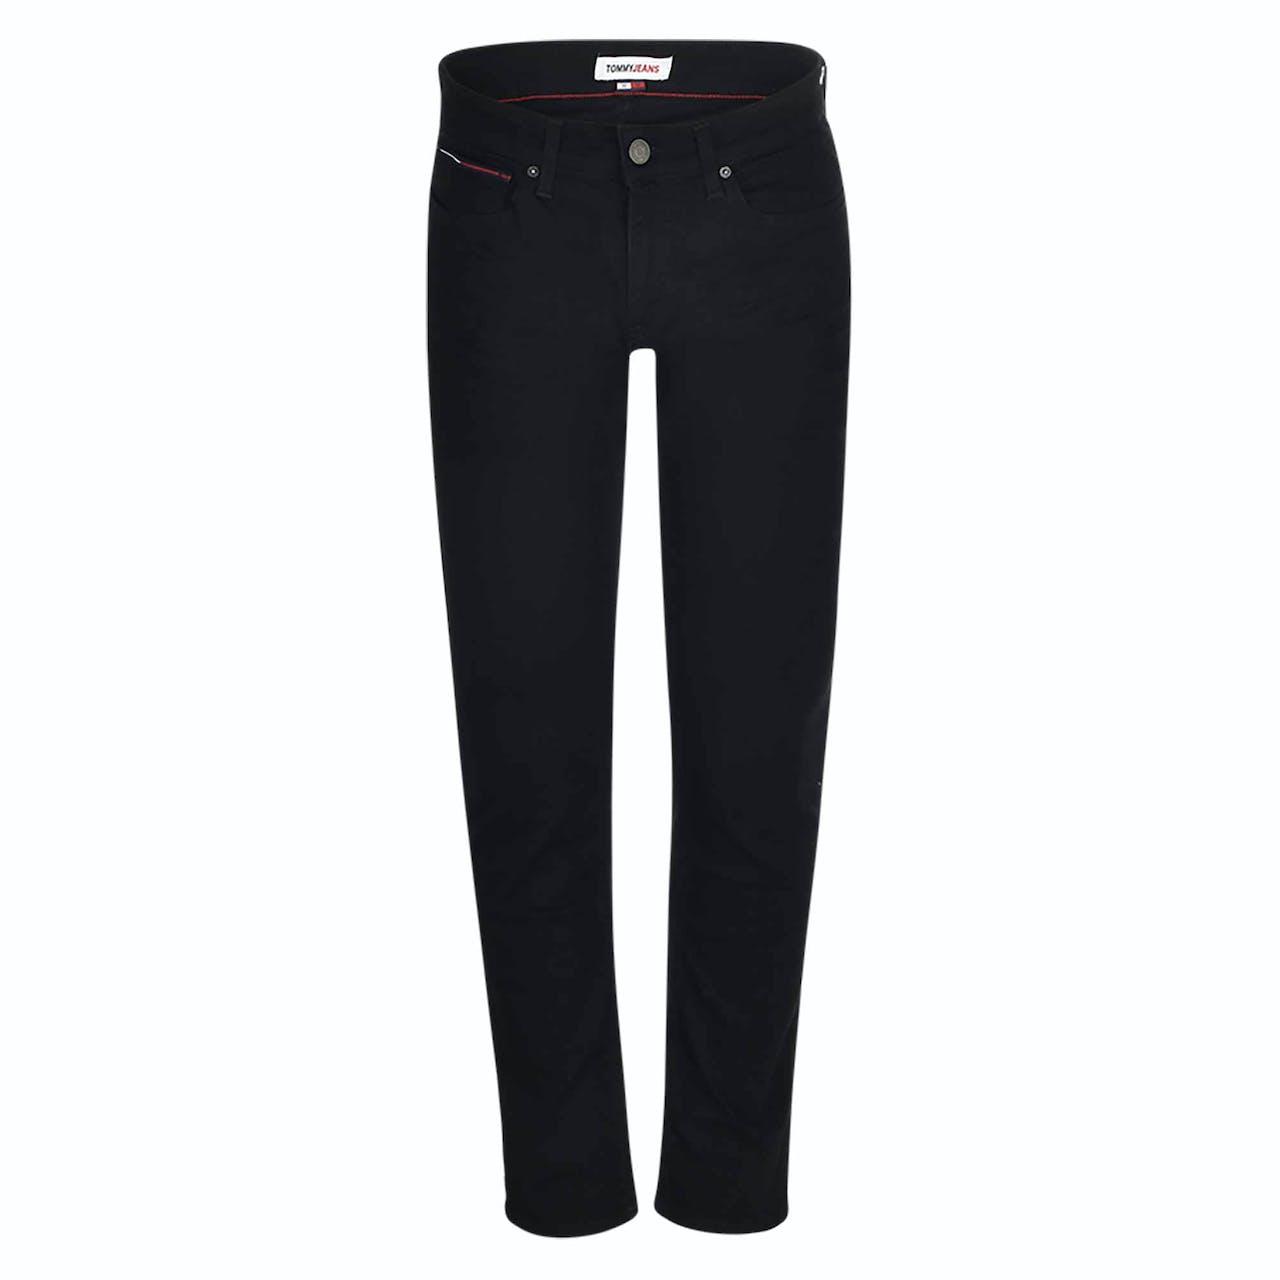 Jeans - Slim Fit - Scanton